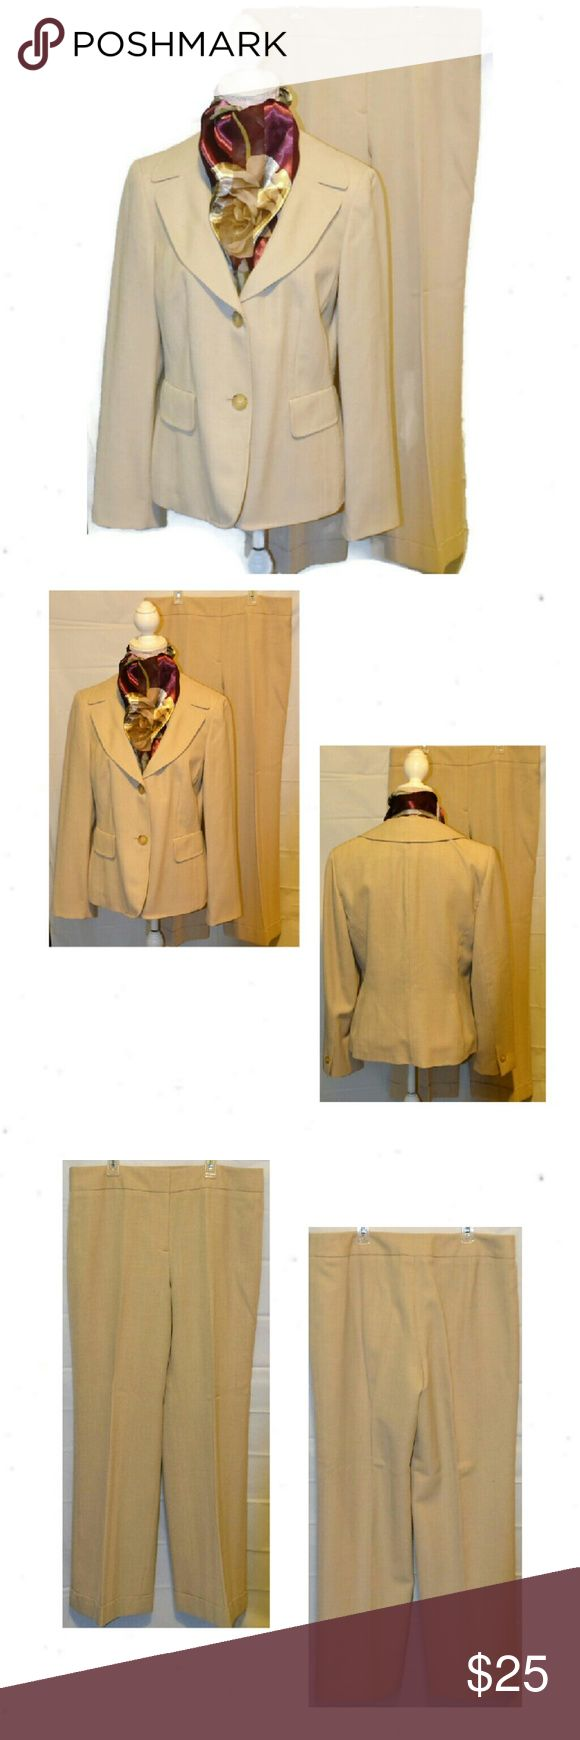 Loft Wool Pantsuit with Chevron Detail. Loft Cream Chevron Pant Suit. Size 12. 100% Wool.  Lined. Blazer has  notched collar, two front flap faux pockets,  two. button closure. Measurements:  Shoulder 17, UA 20, Sleeve 24, L24. Pants are wide leg with hemline cuffs. faux cuffs. Button hook closure. Meassurements:  L40, I 30, R10, W34. LOFT Jackets & Coats Blazers